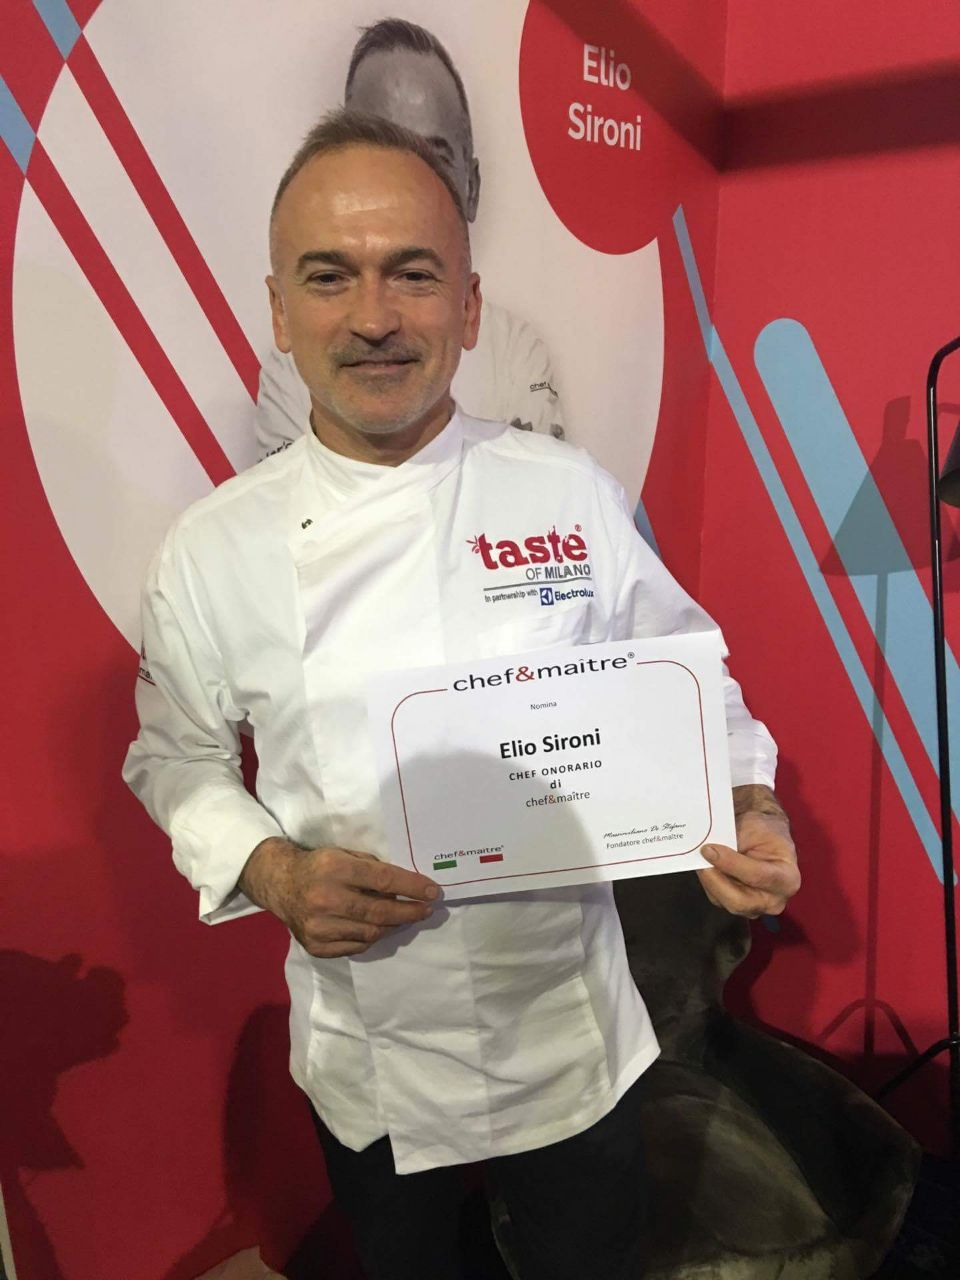 Img 20170509 wa0011 for Taste of milano 2017